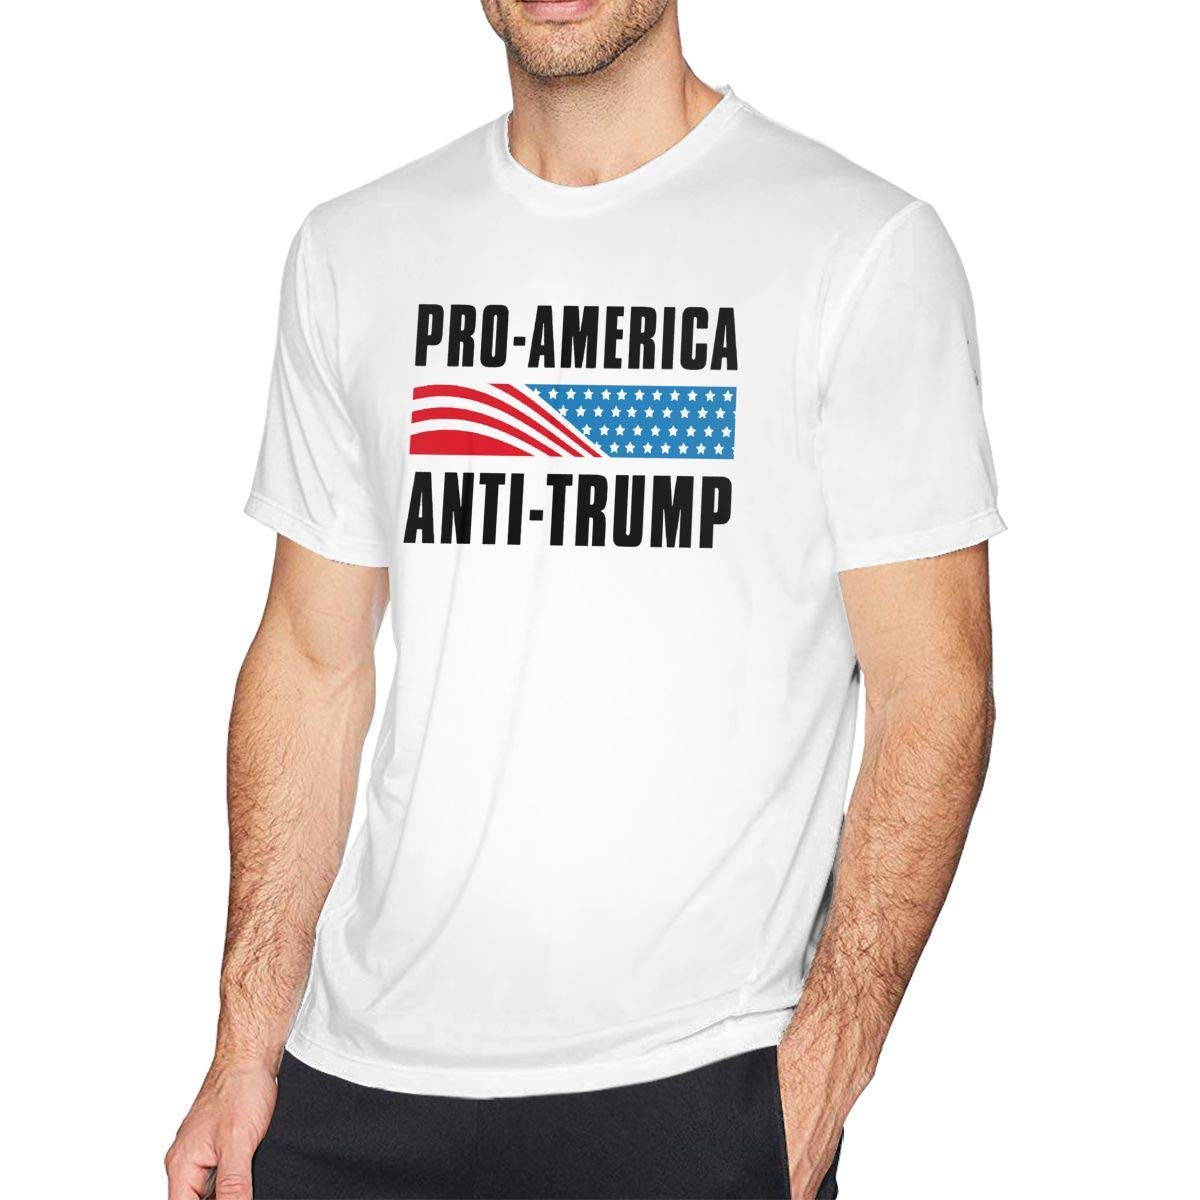 Casual Pro America Anti Trump, White Shirts